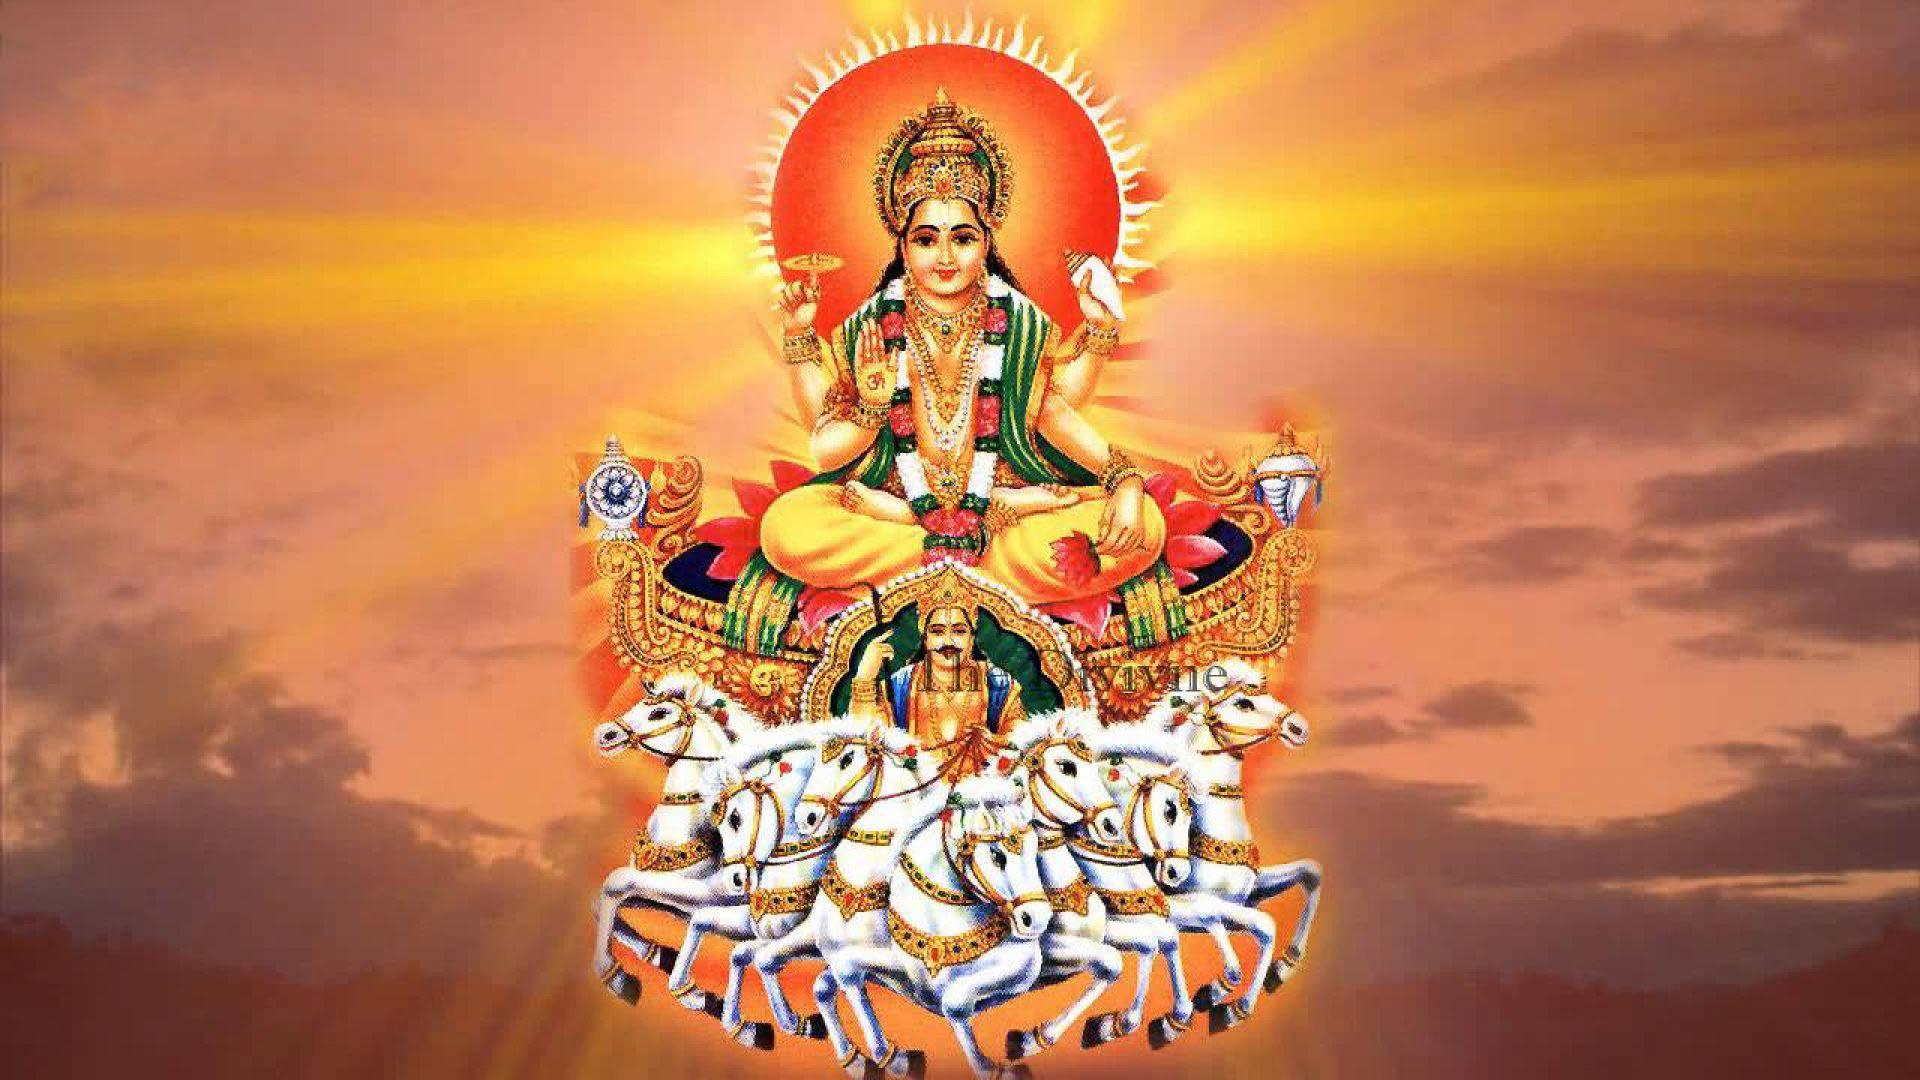 Sun God Images Download God Sun 1920x1080 Wallpaper Teahub Io